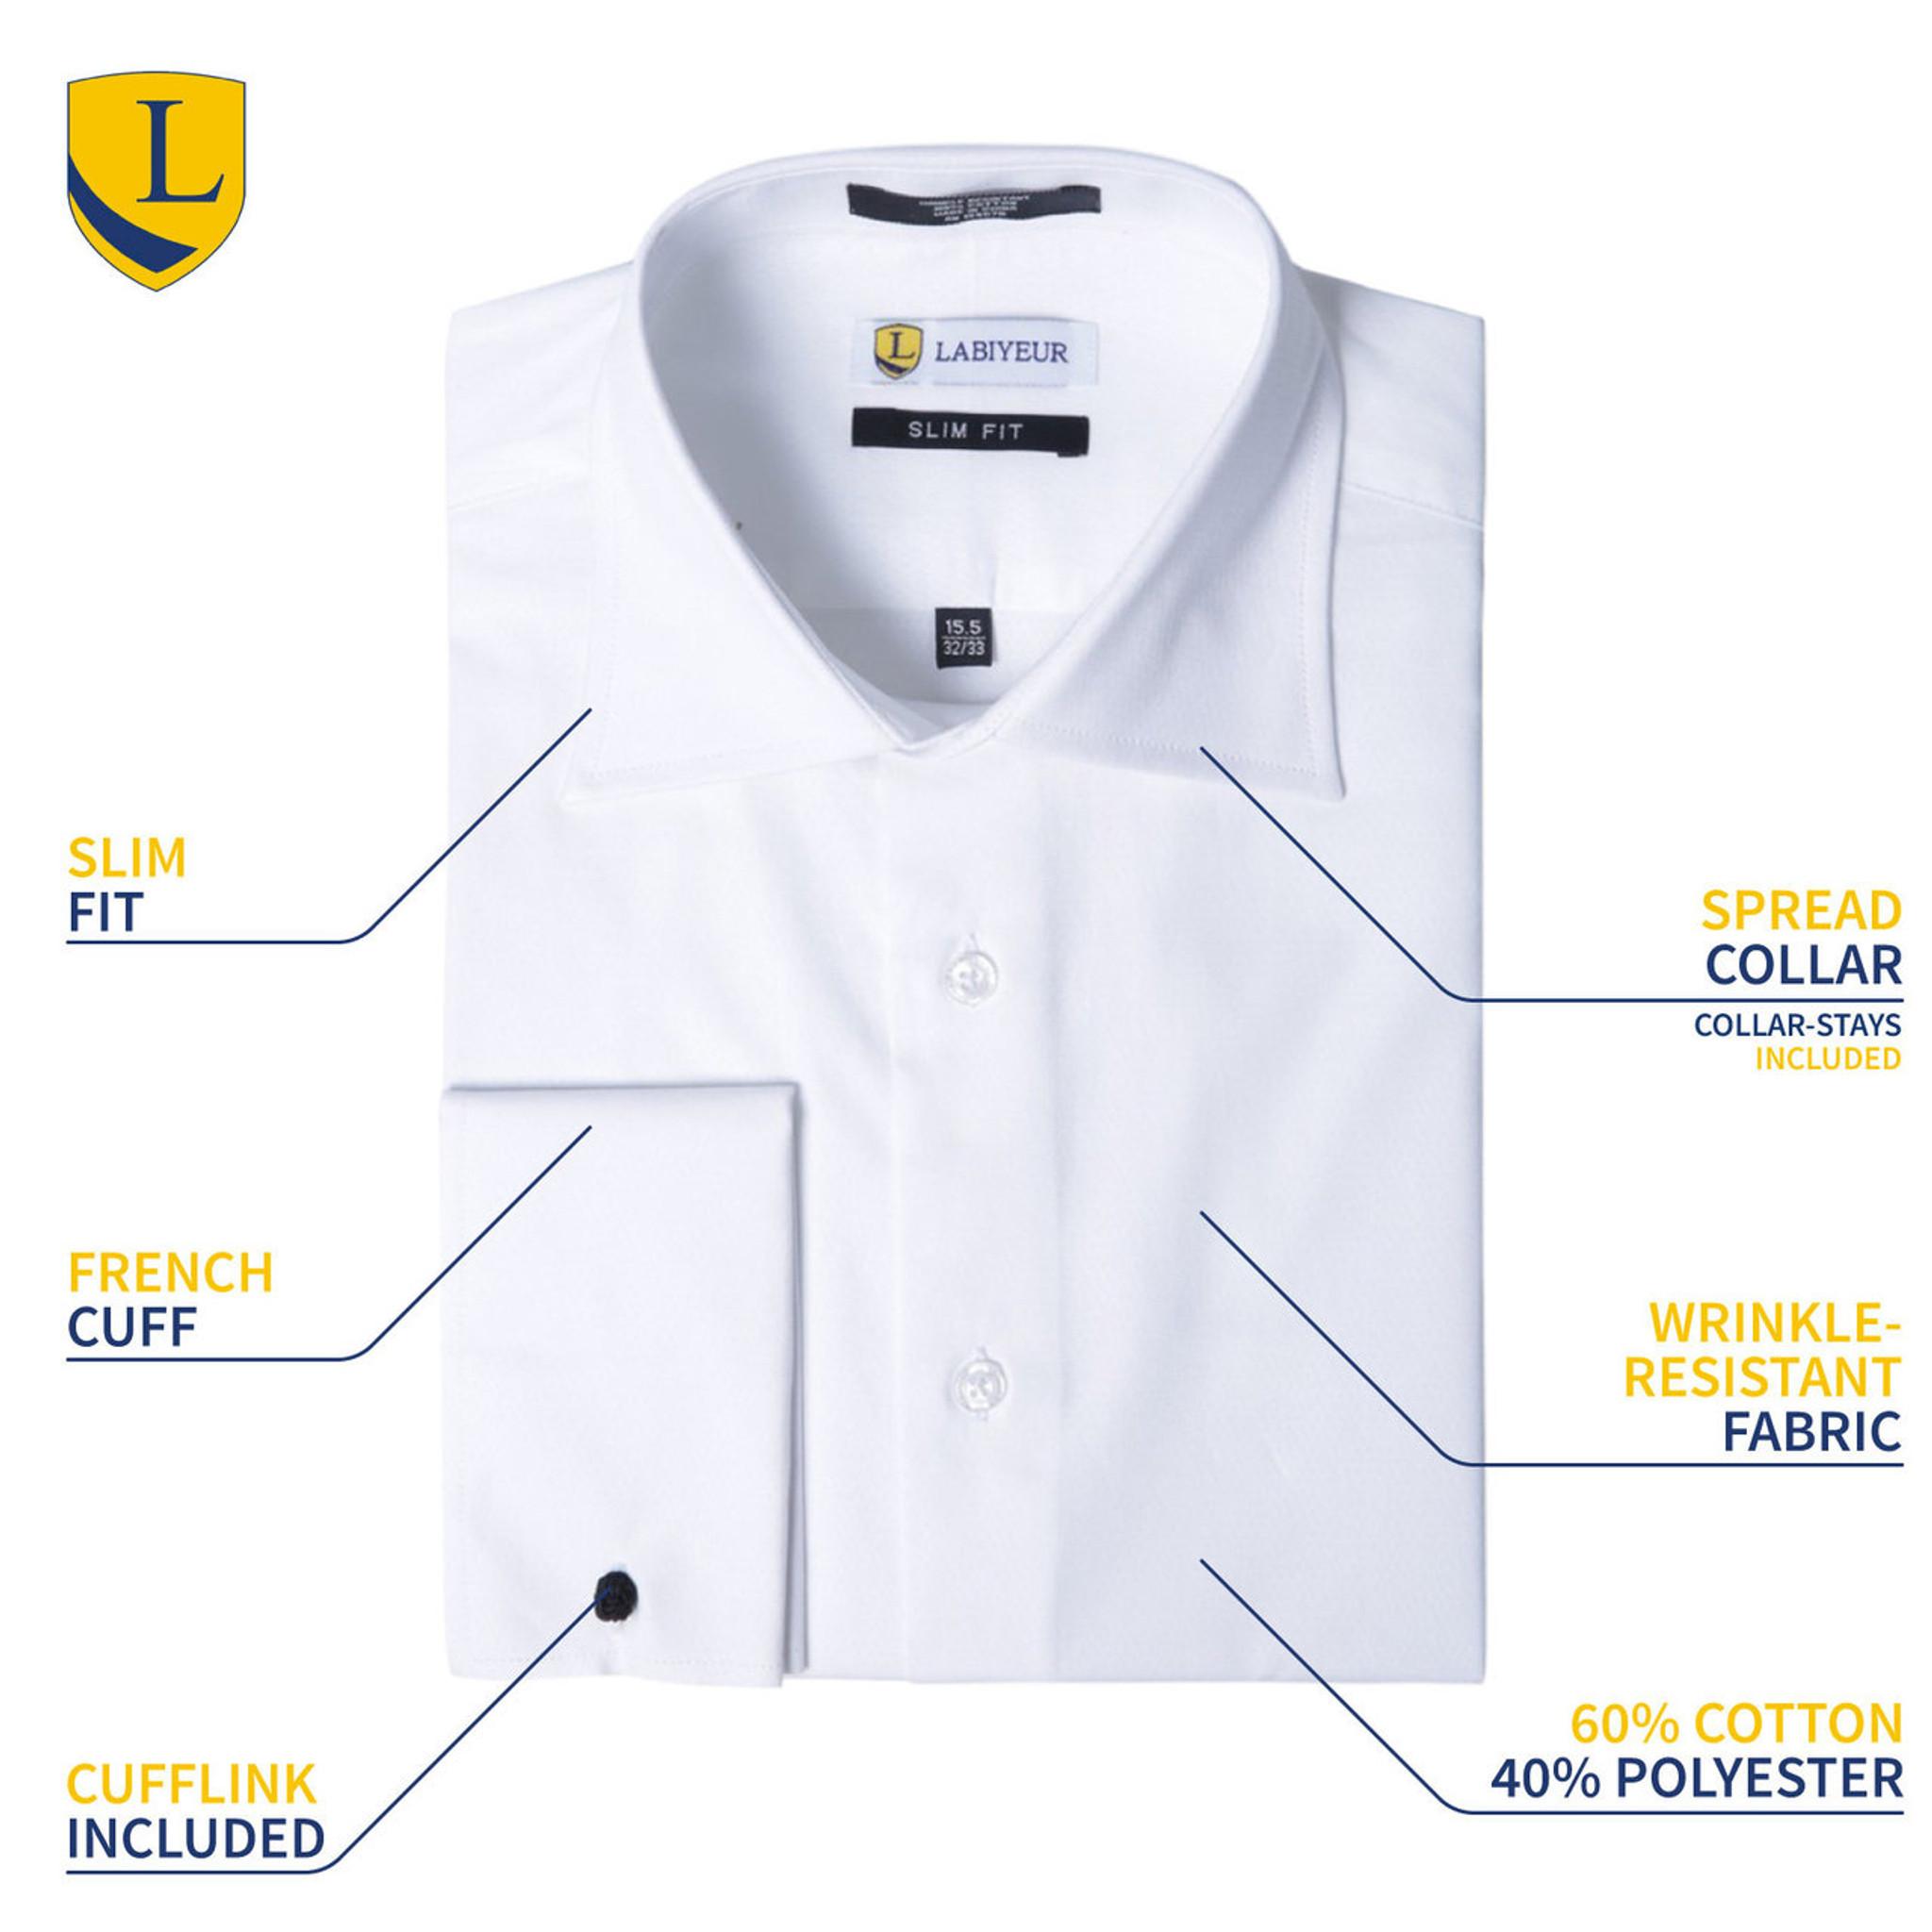 Labiyeur Men/'s Slim Fit French Cuff Poplin Cotton Blend Solid Dress Shirt White